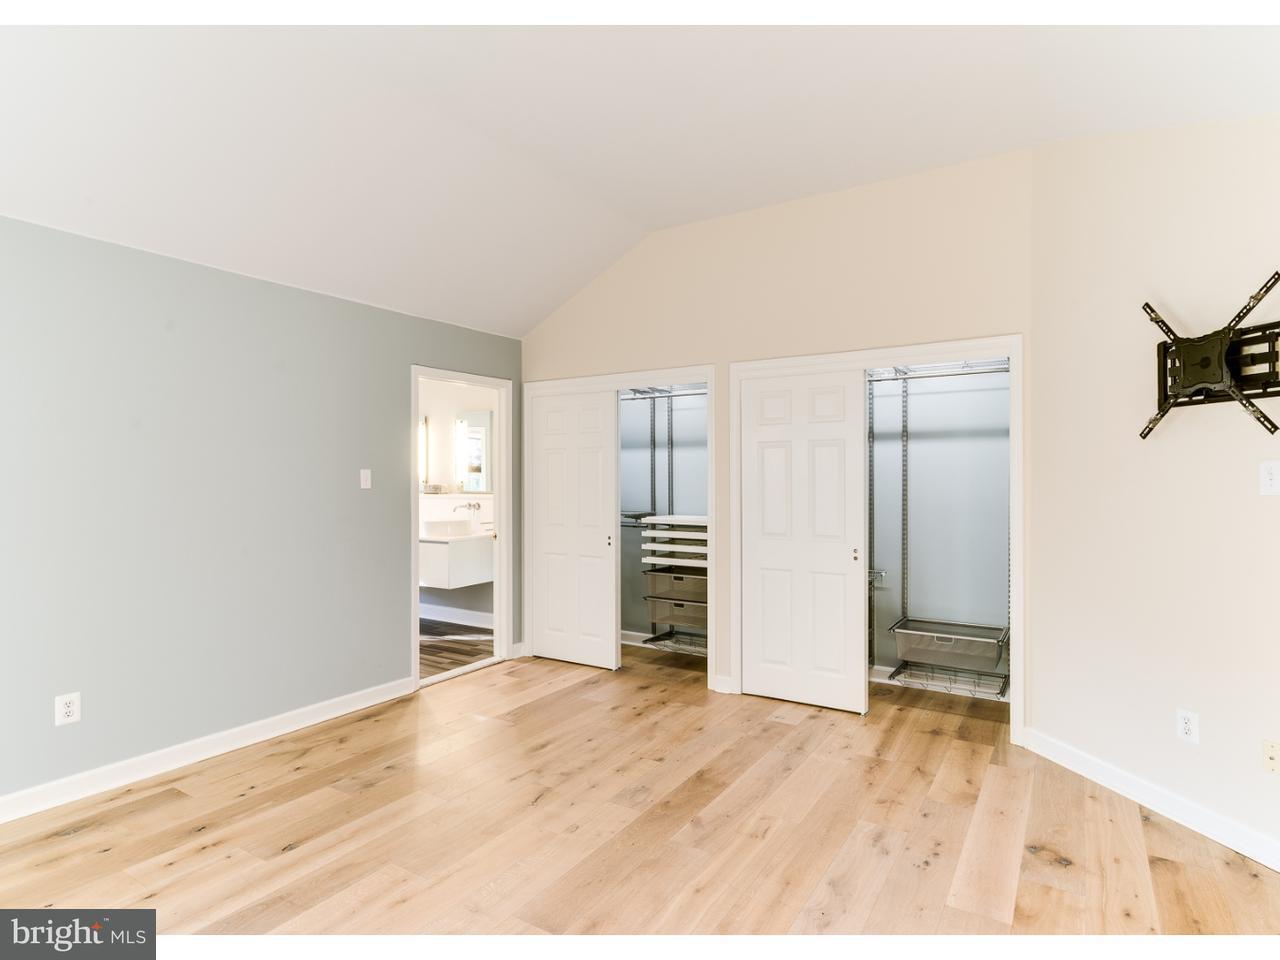 Additional photo for property listing at 46 WYCKLOW Court  Robbinsville, Нью-Джерси 08691 Соединенные Штаты